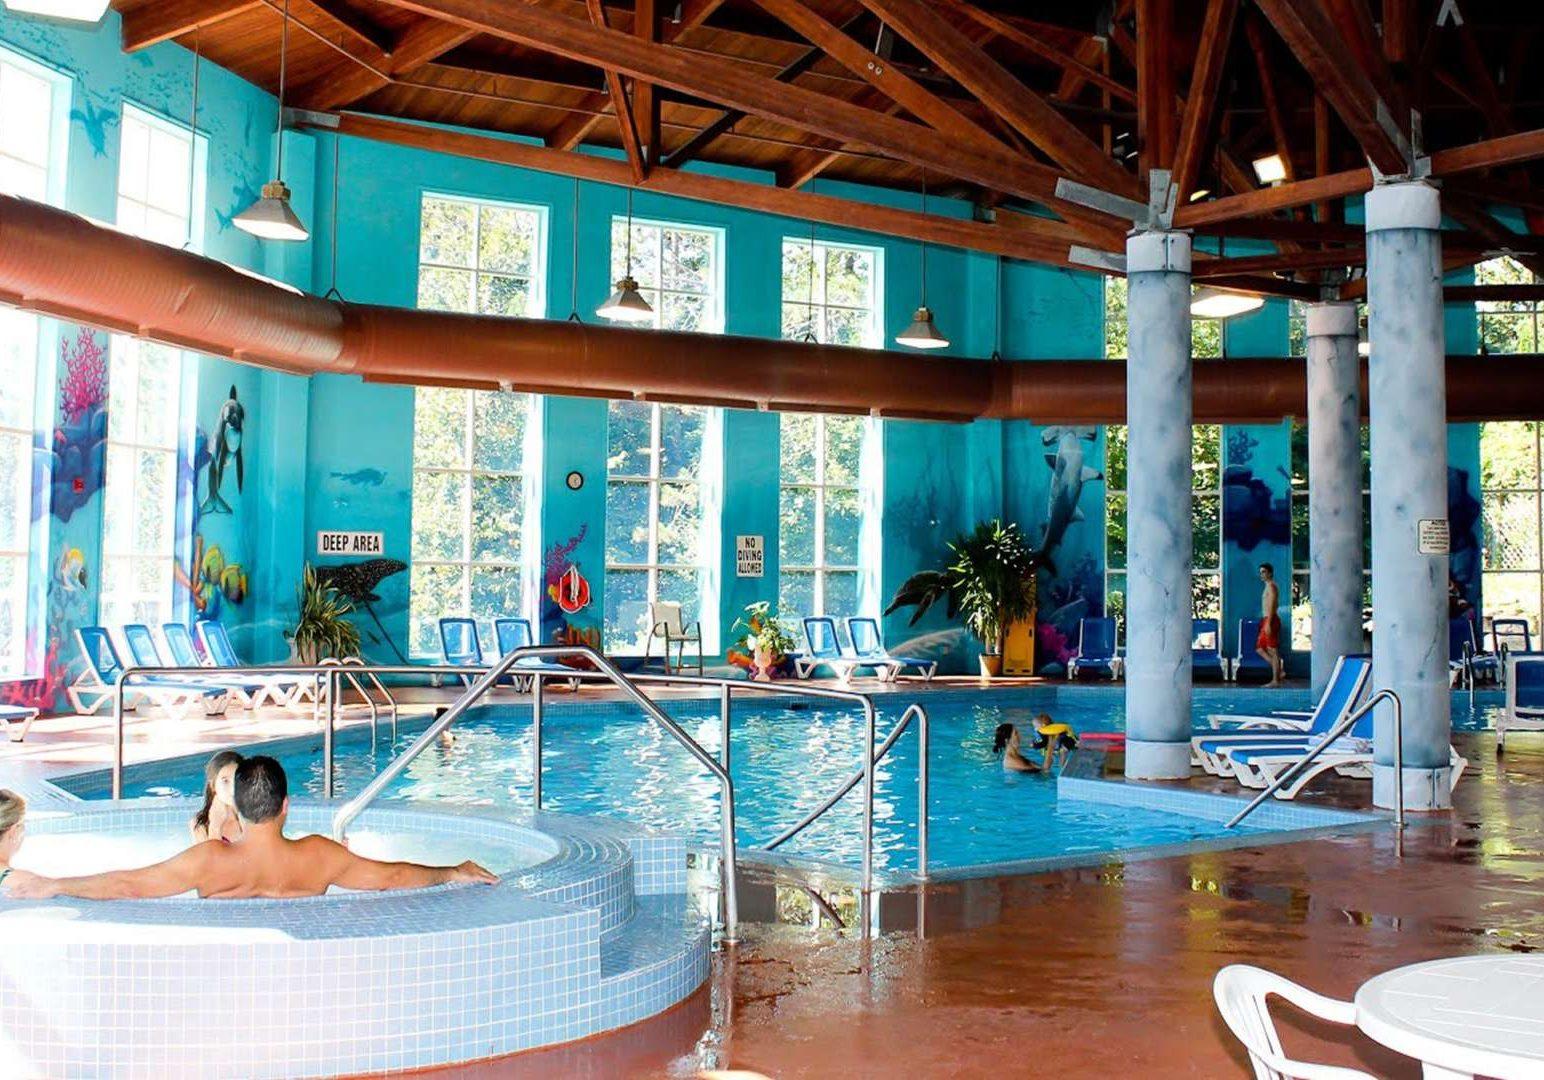 kids-activities-pool-fun-2-1920x1080